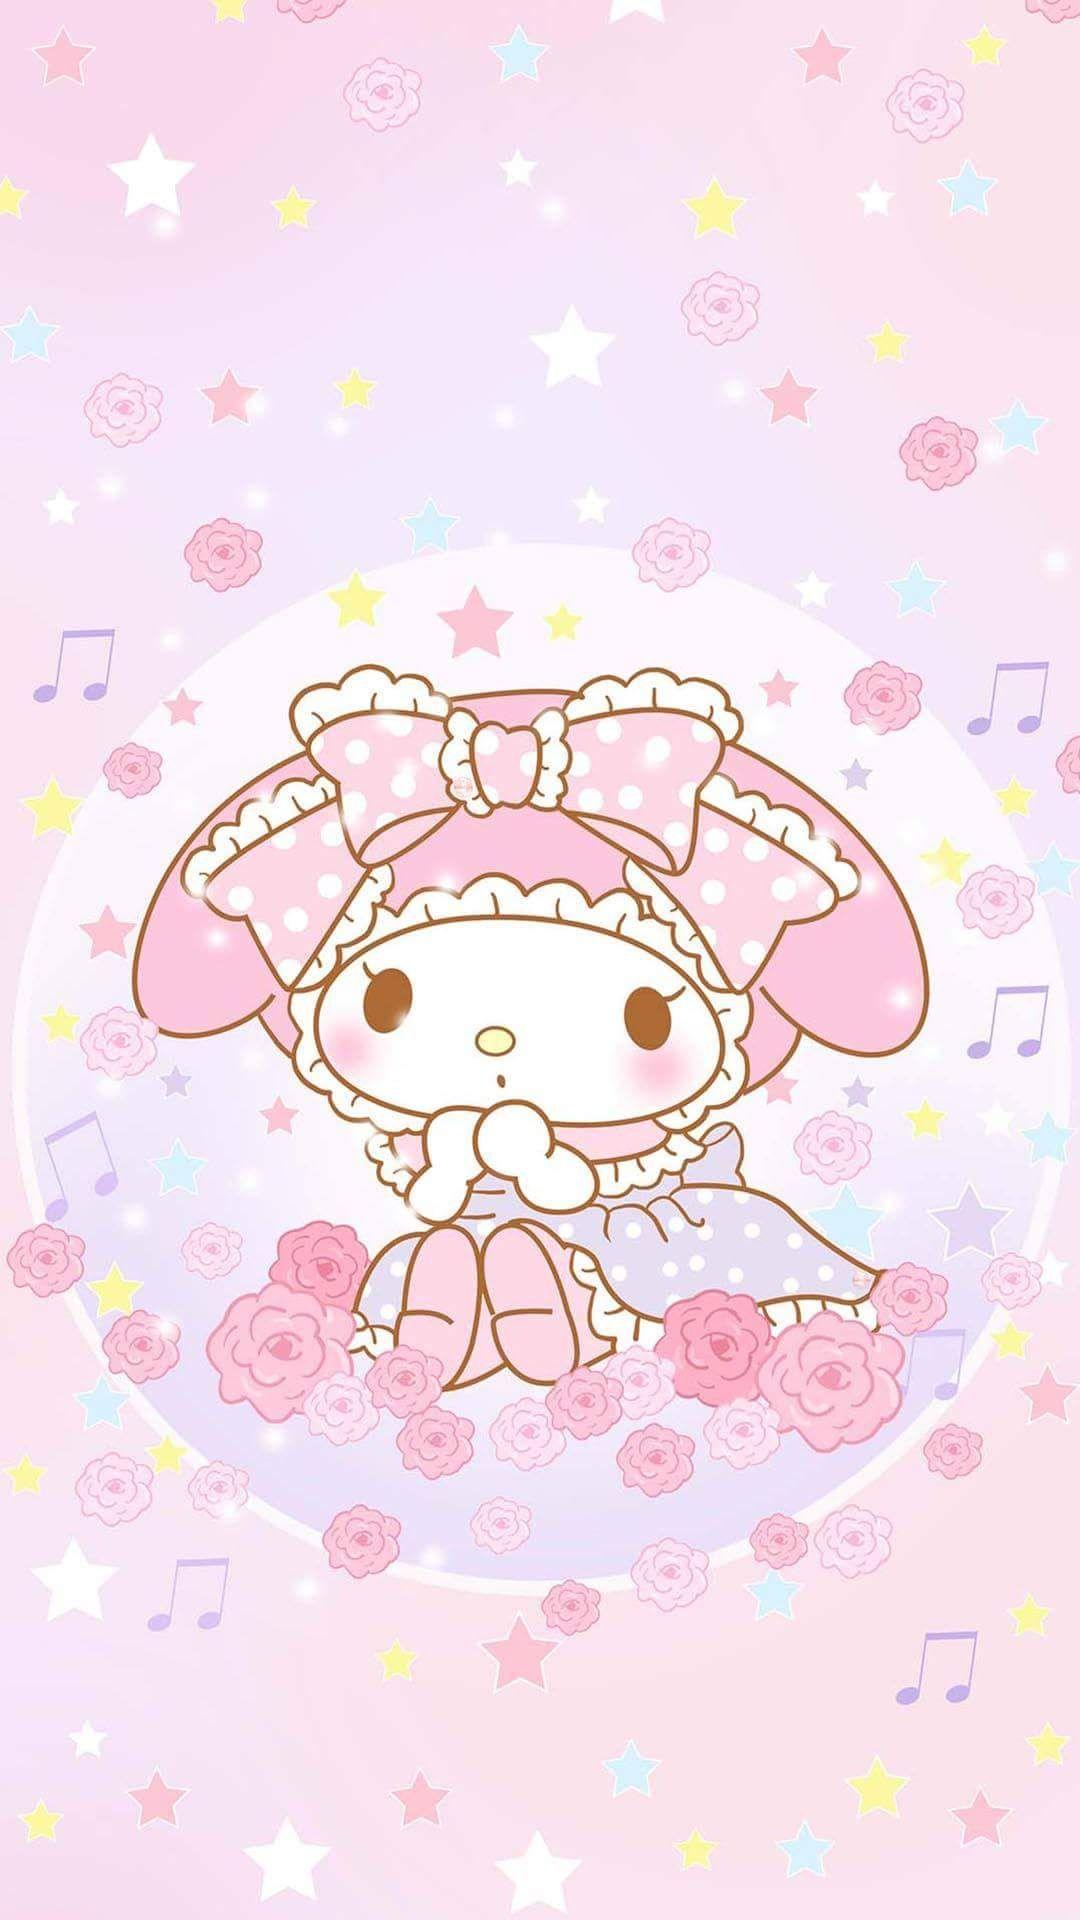 My Melody คาวาอ ภาพประกอบ วอลเปเปอร ด สน ย